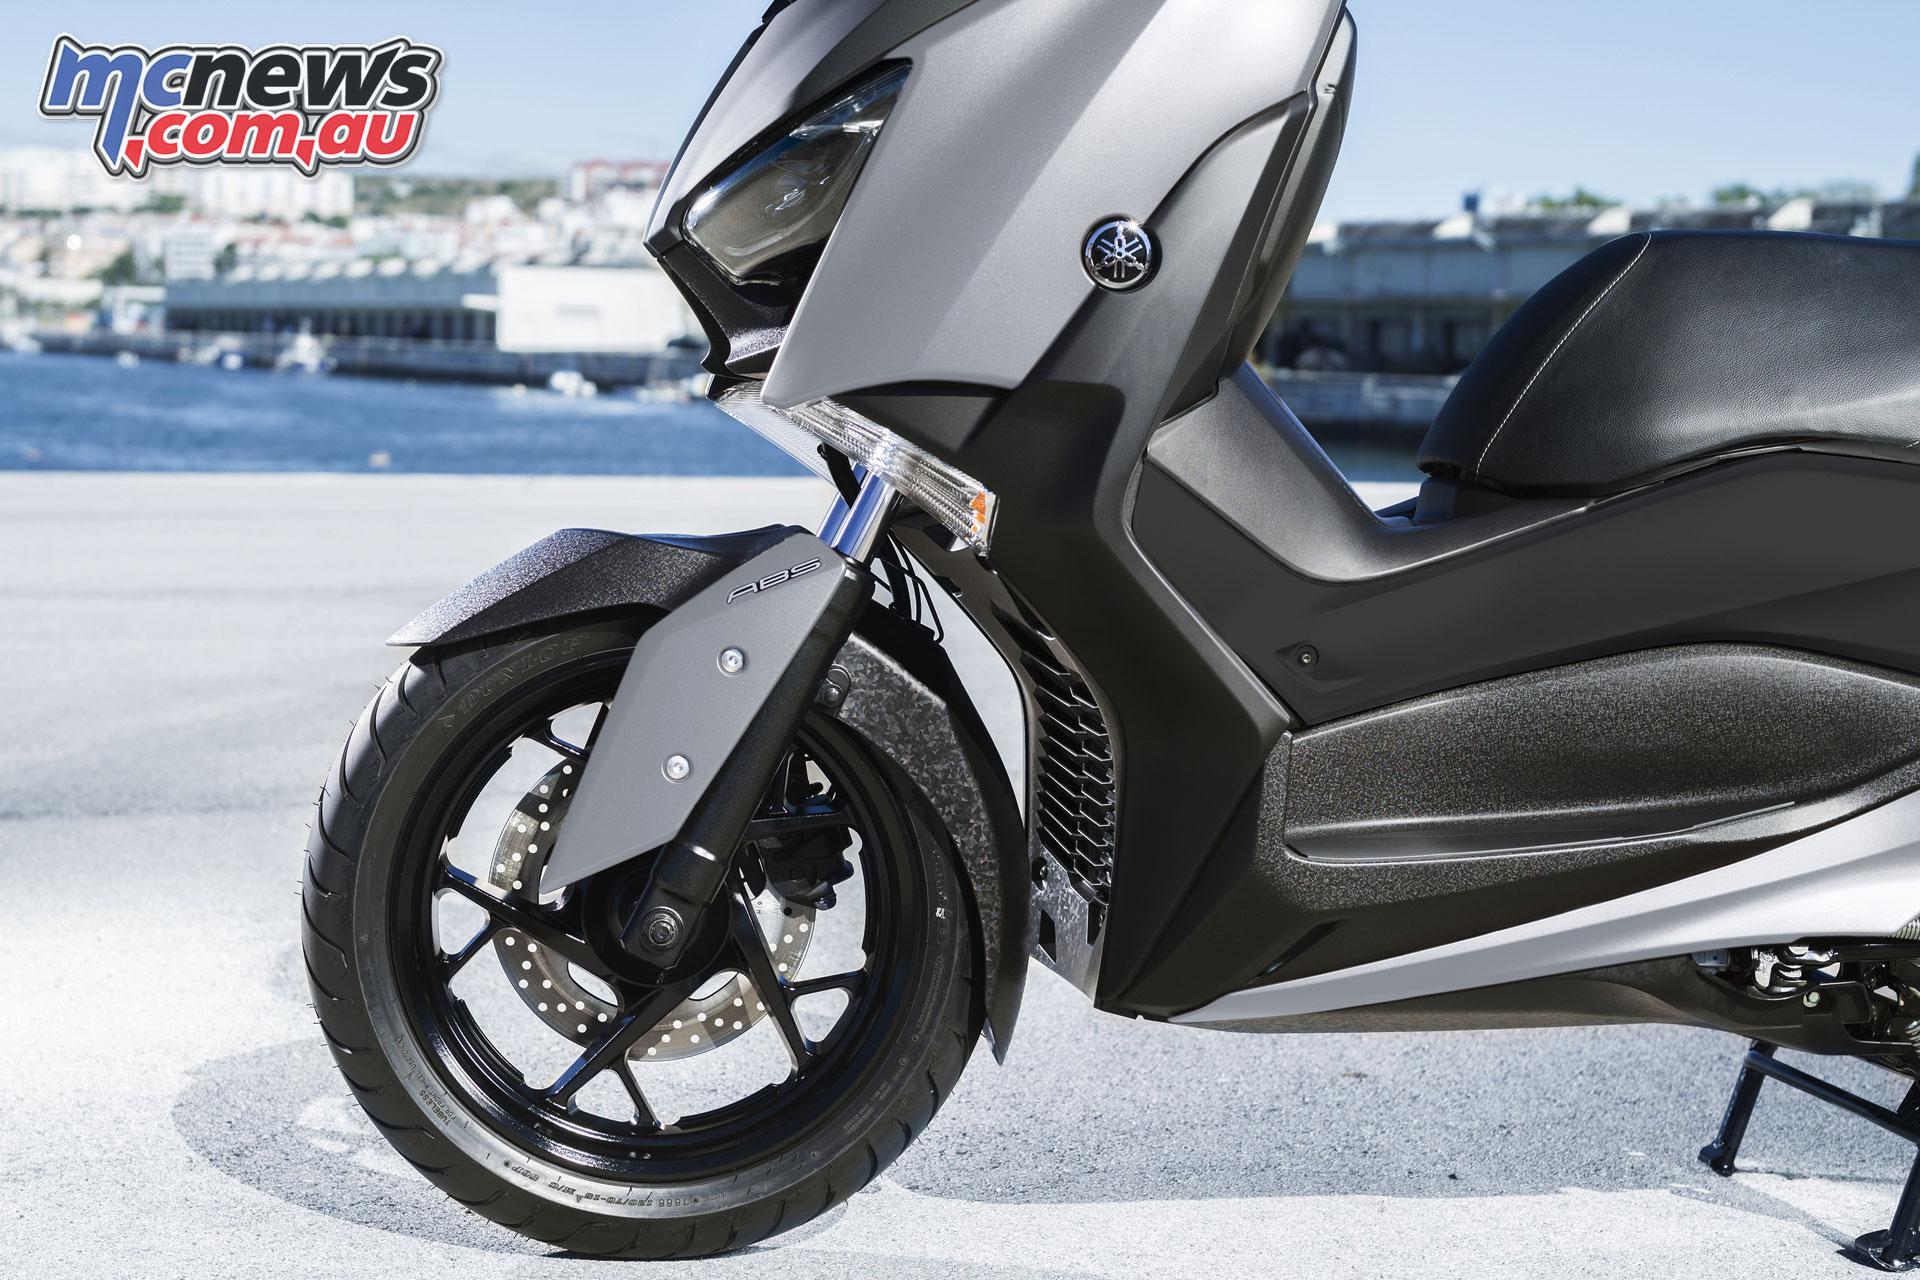 2019 Yamaha XMAX 300 arrives   $6999 RRP   MCNews com au